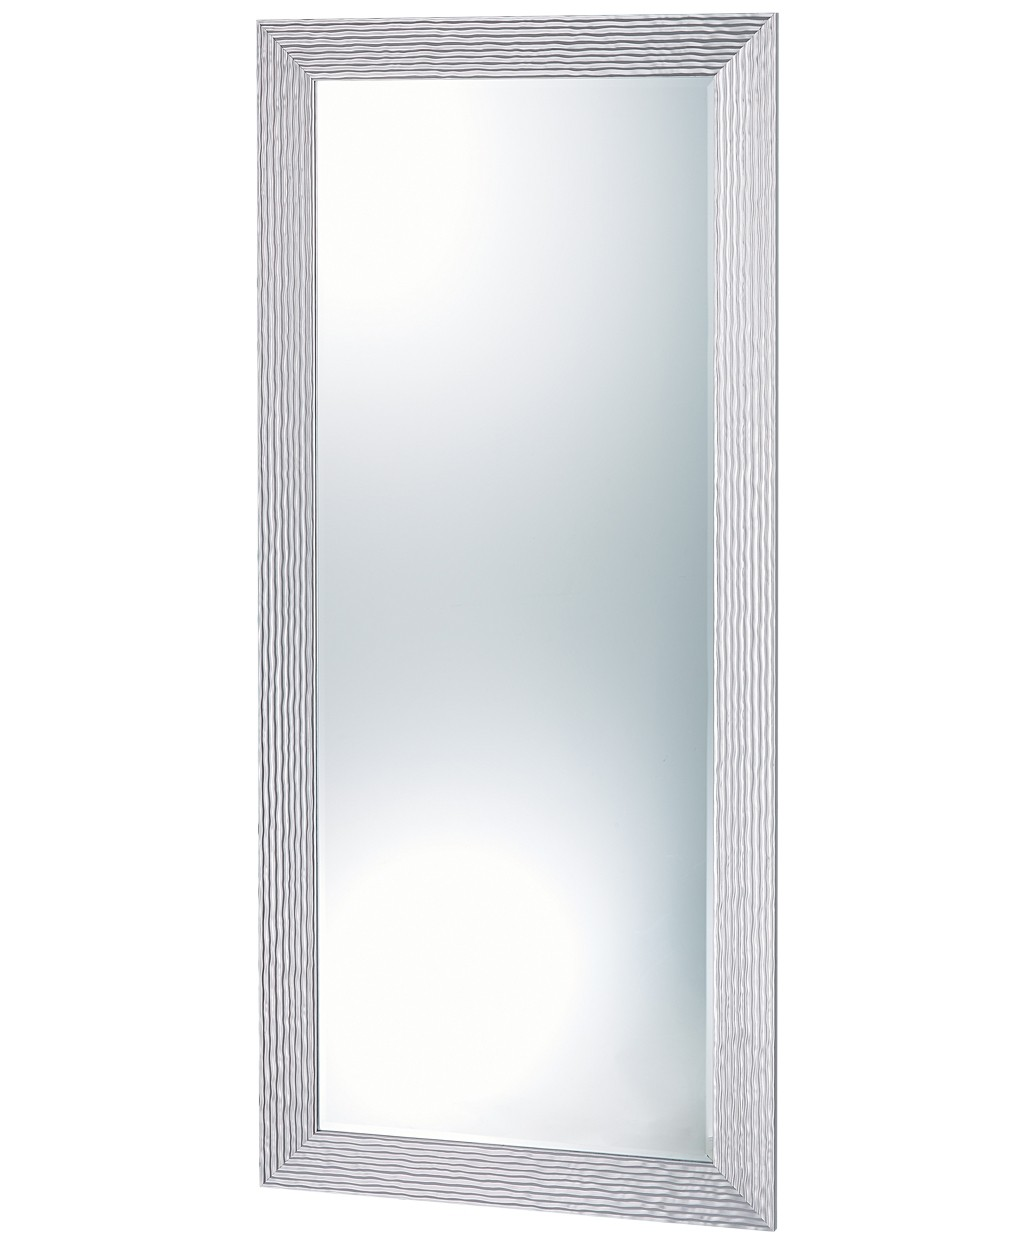 Pibbs Wave Salon Mirror